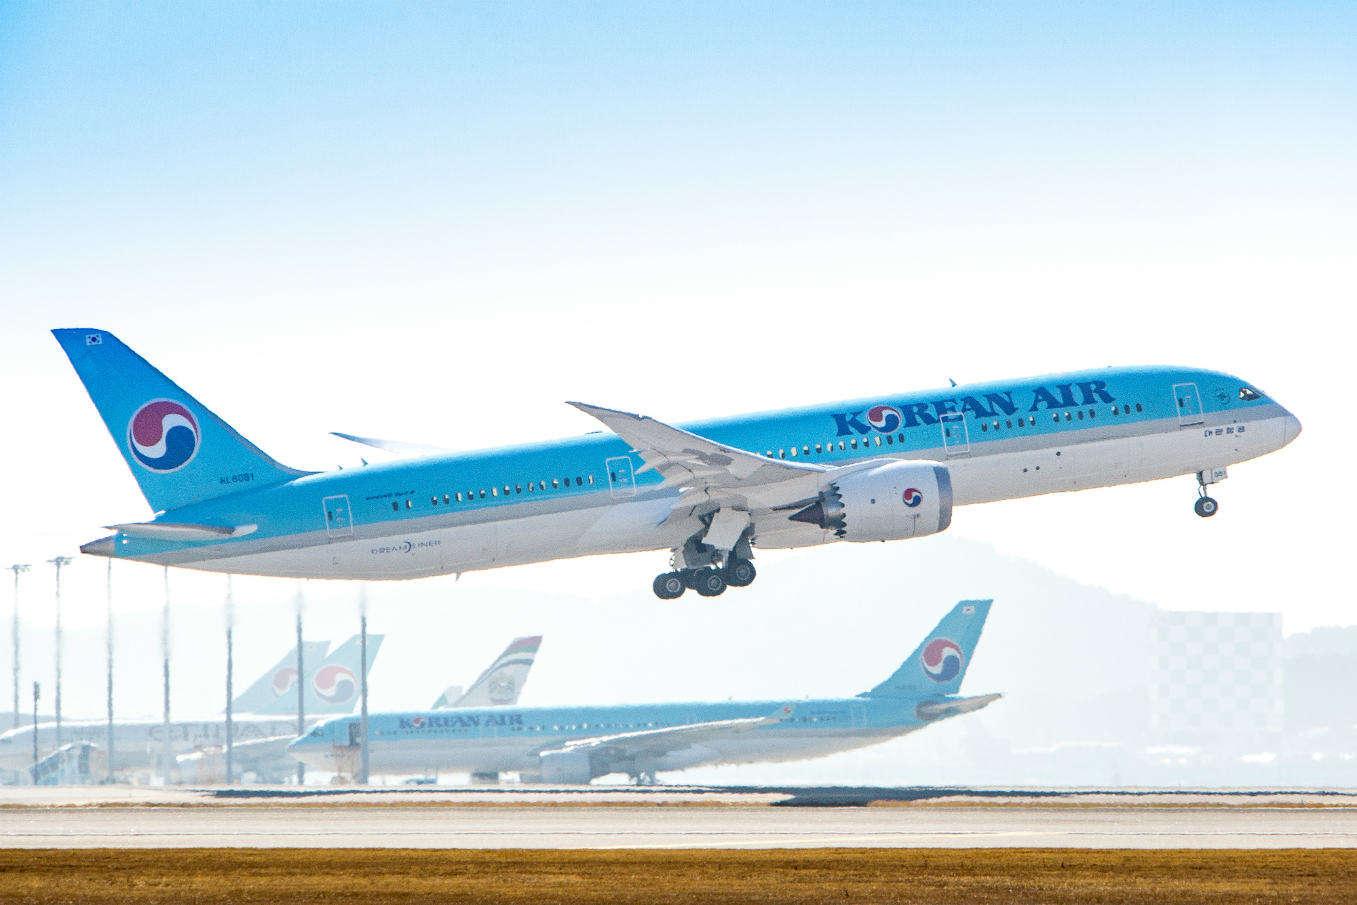 Delta Air Lines takes 4.3% from Korean Air's majority shareholder